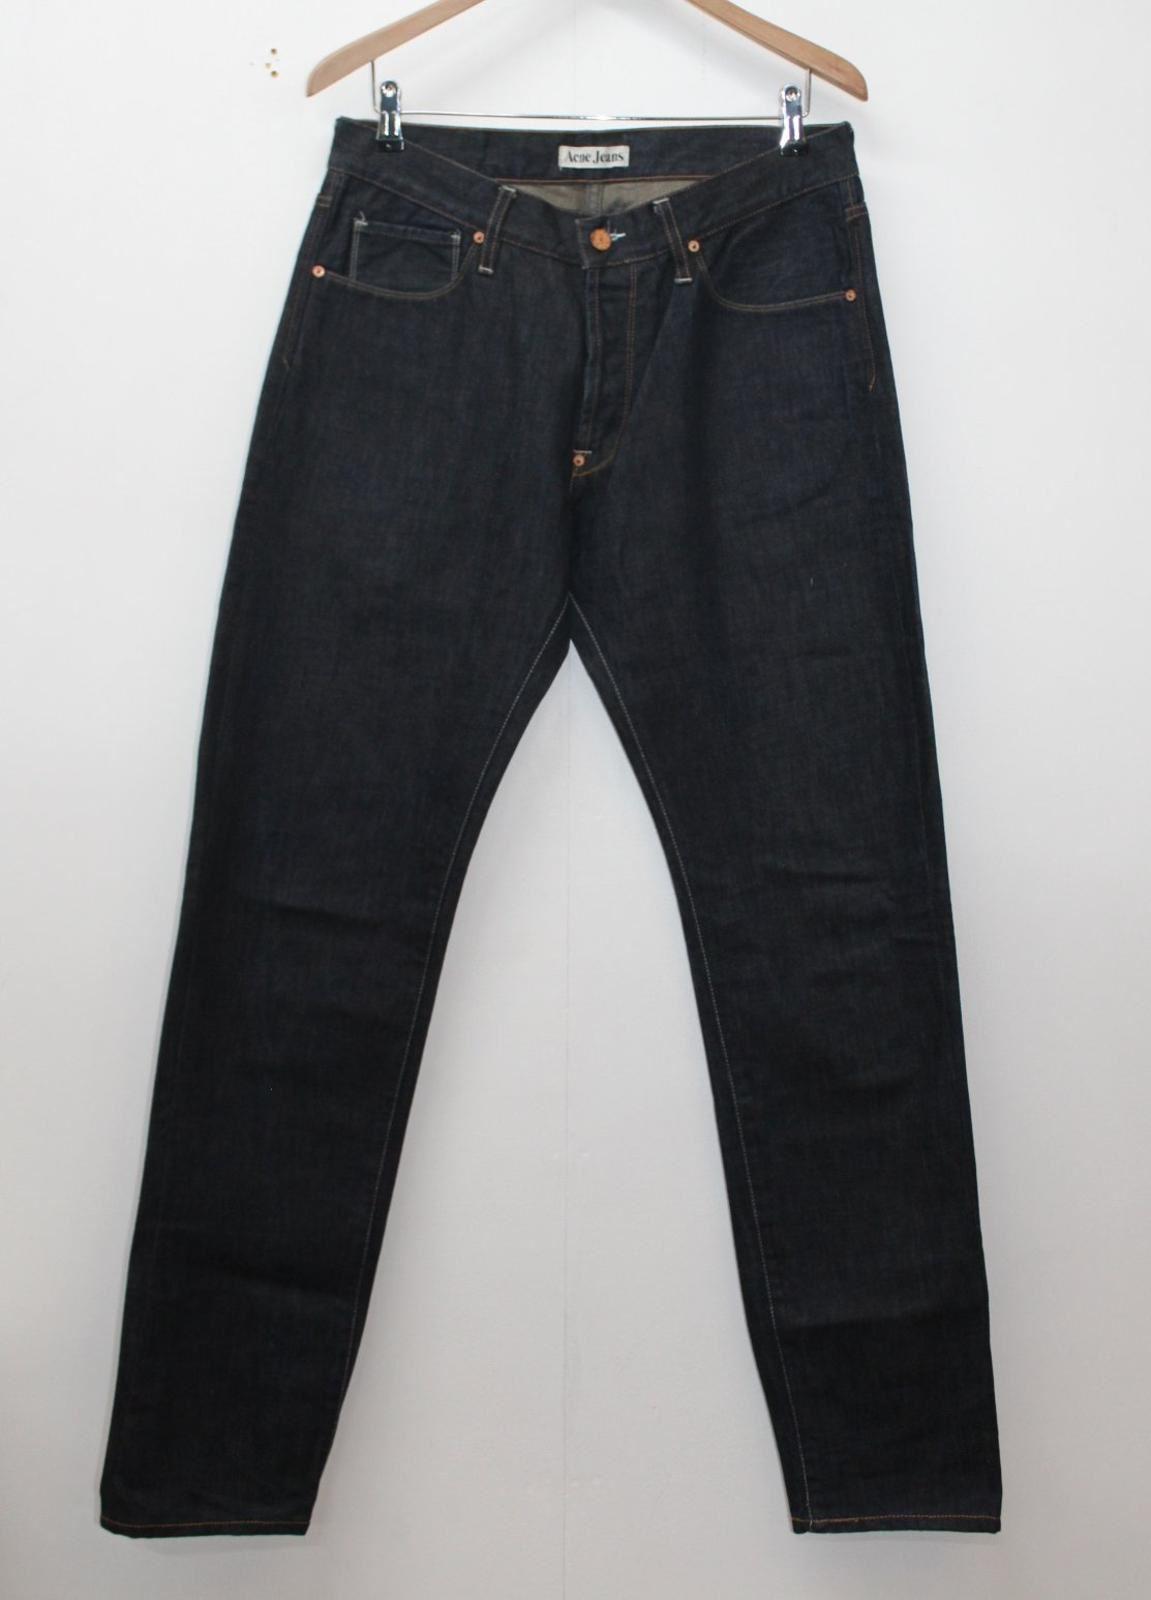 ACNE STUDIOS Men's Dark Blau Cotton Button Fly Straight Leg Jeans W33 L34